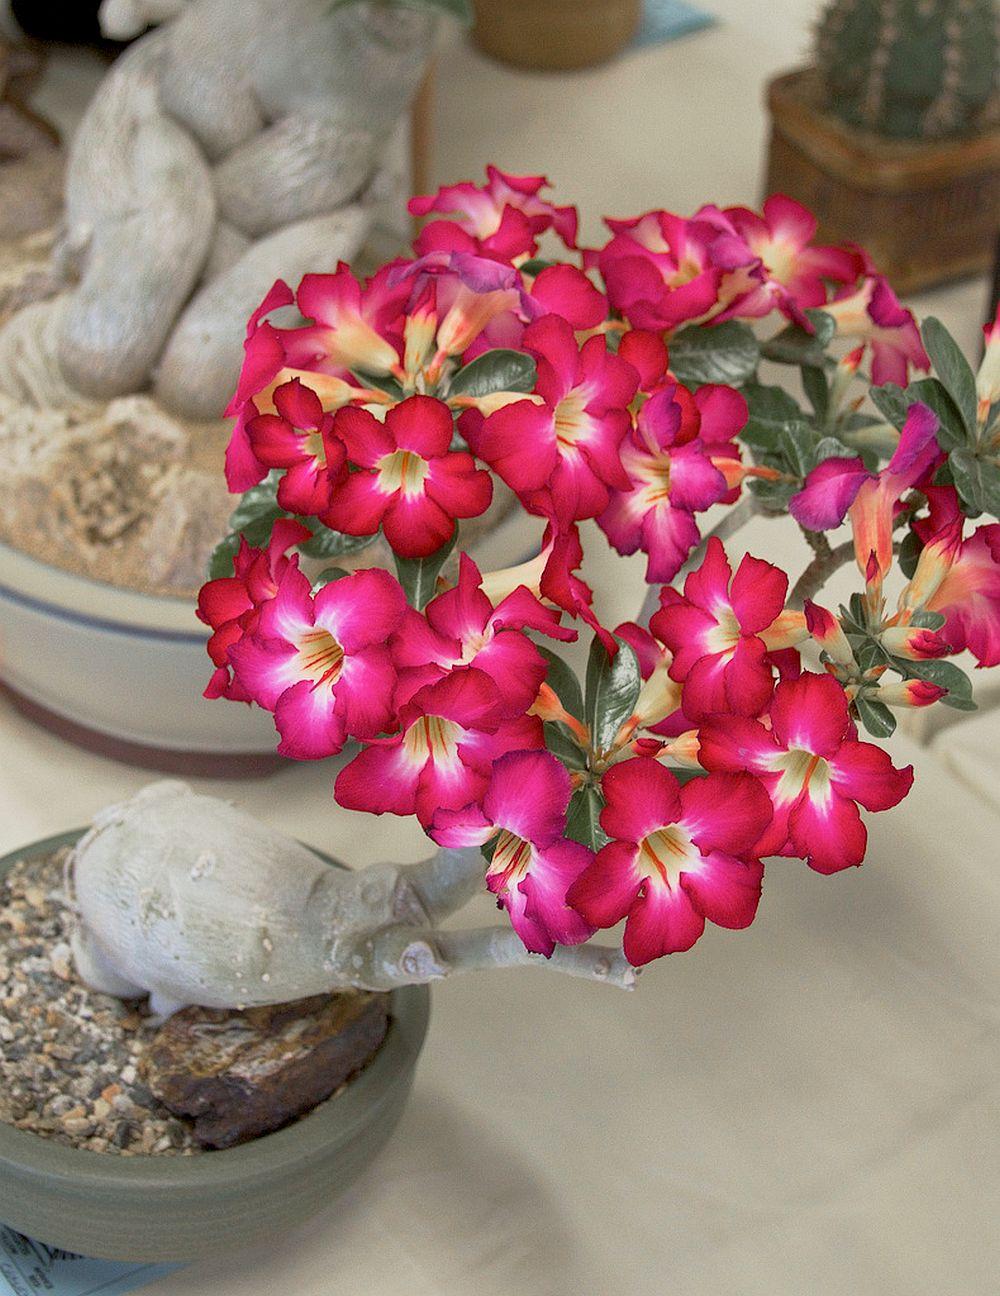 adelaparvu.com despre Adenium Obesum, Trandafirul desertului, Text Carli Marian  (7)